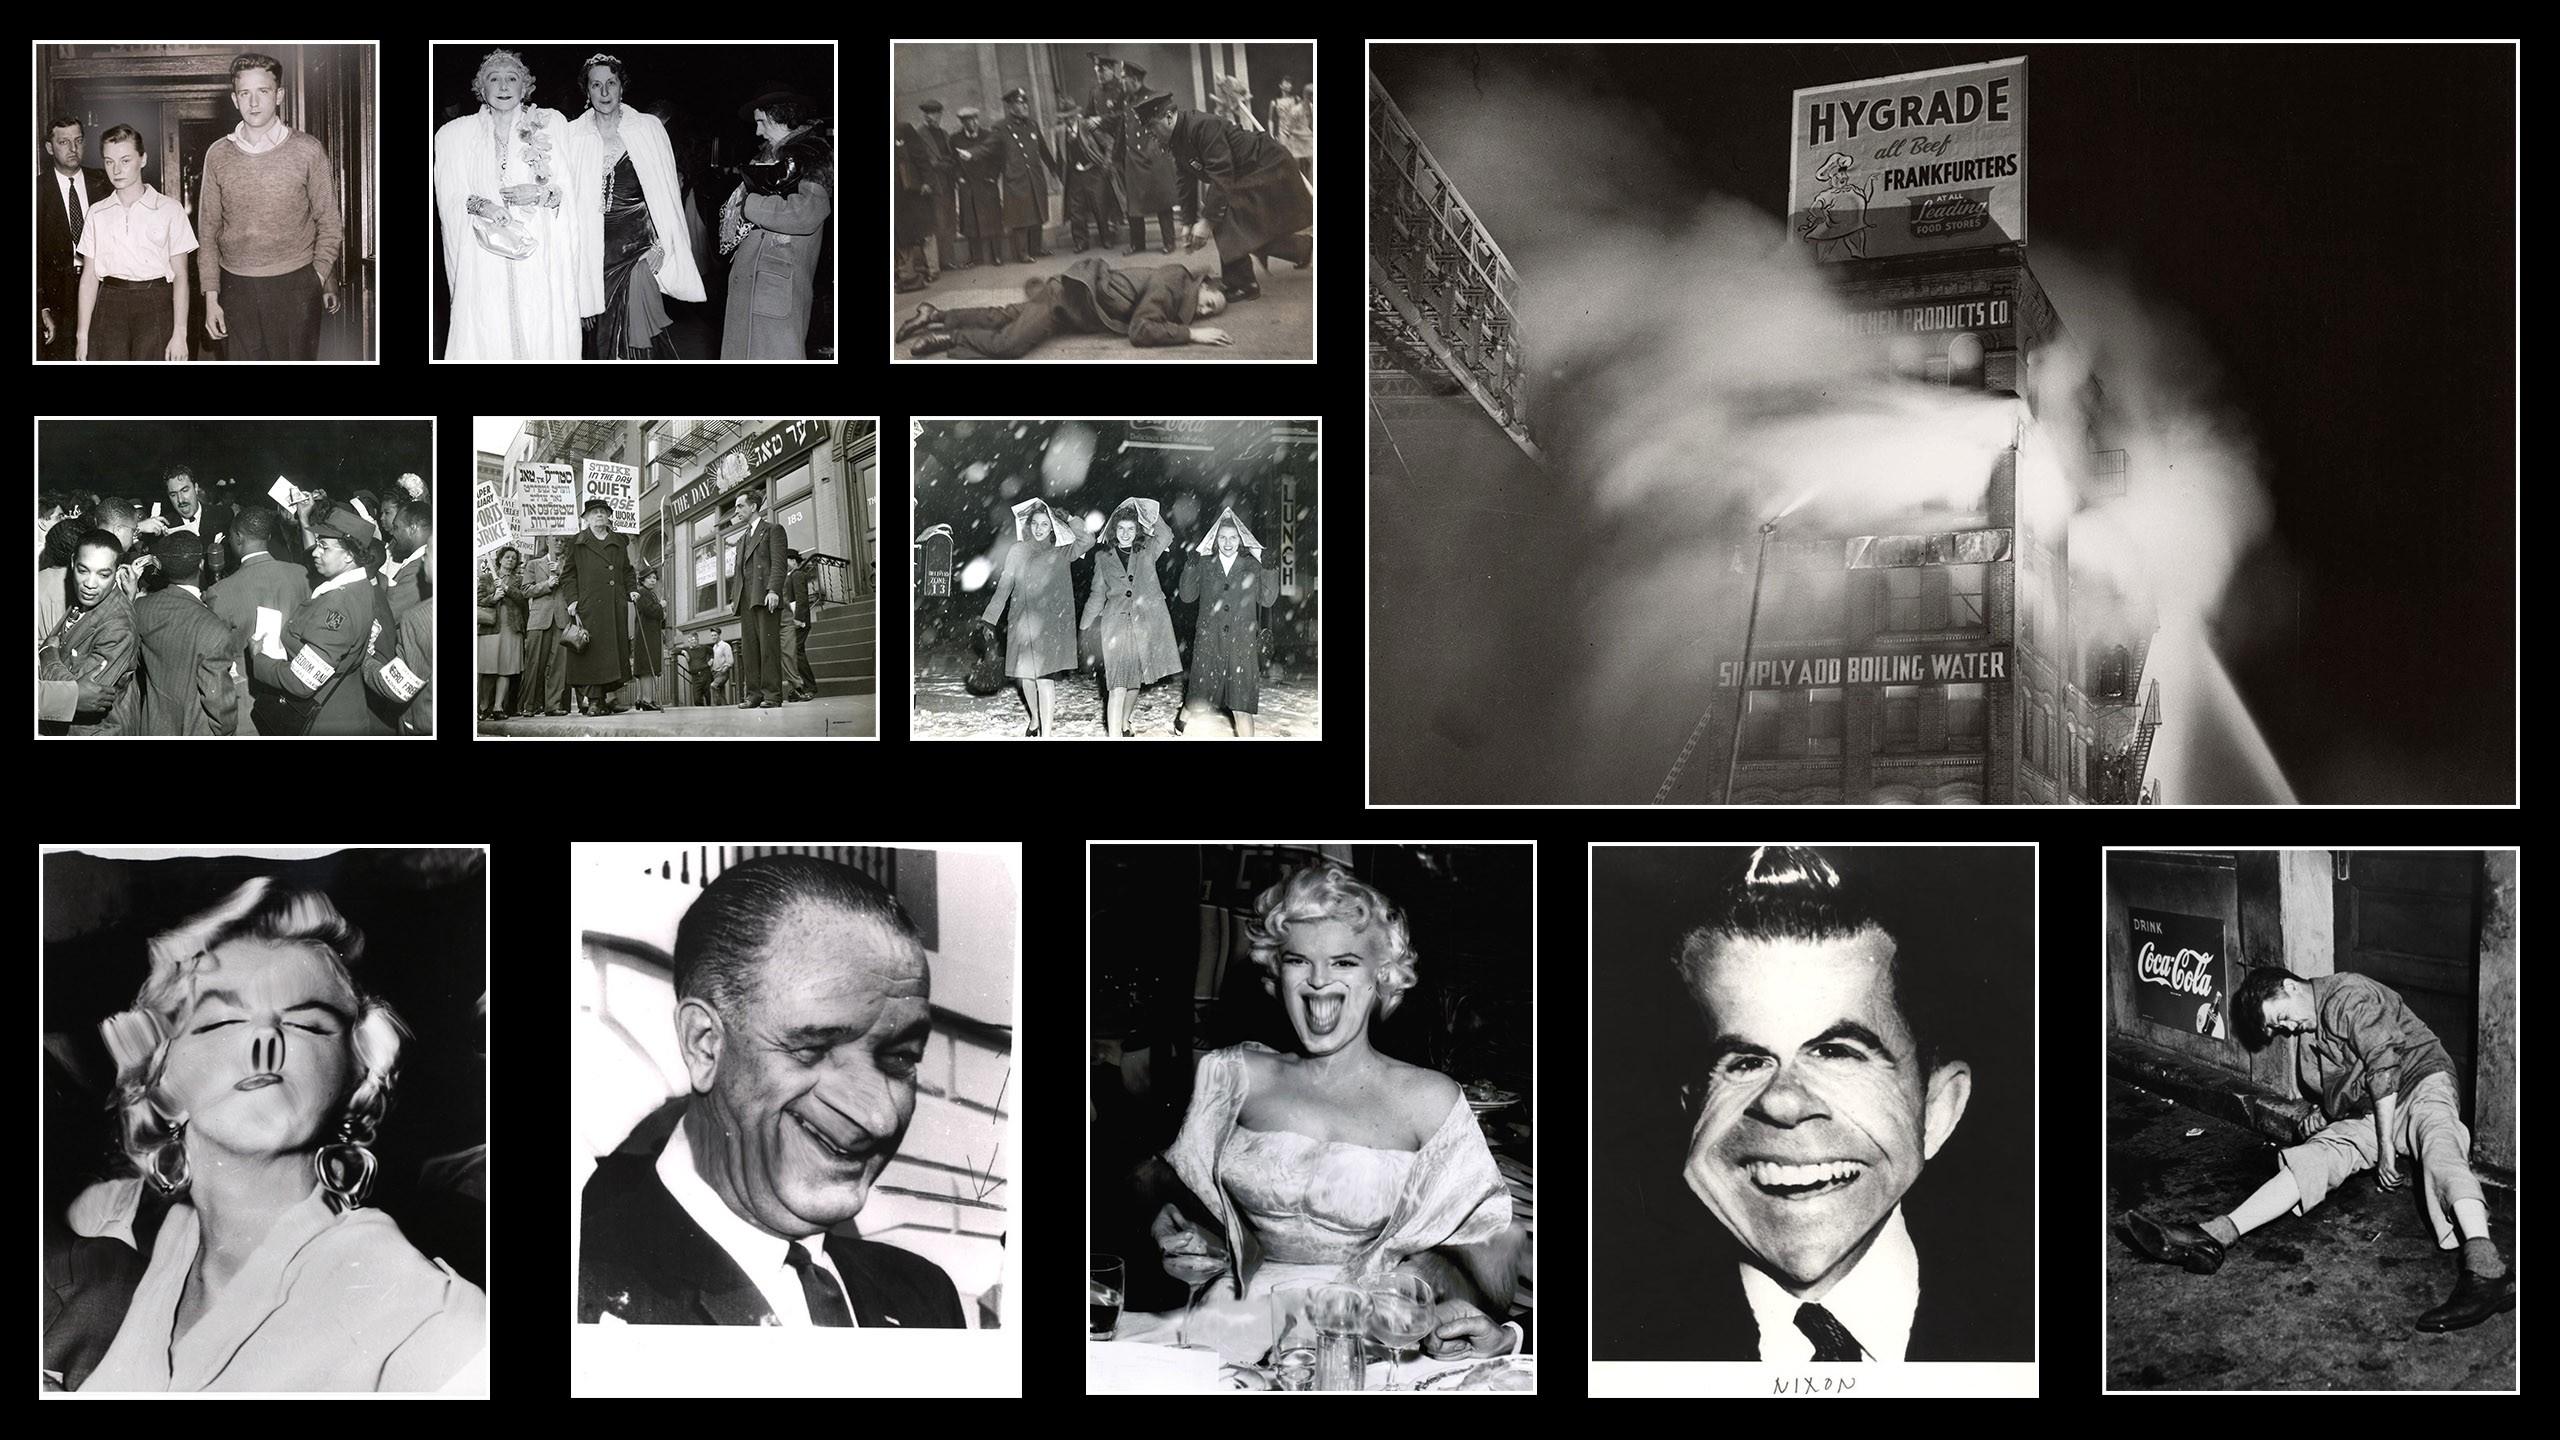 On Photography: The work of Weegee a.k.a. Arthur Fellig